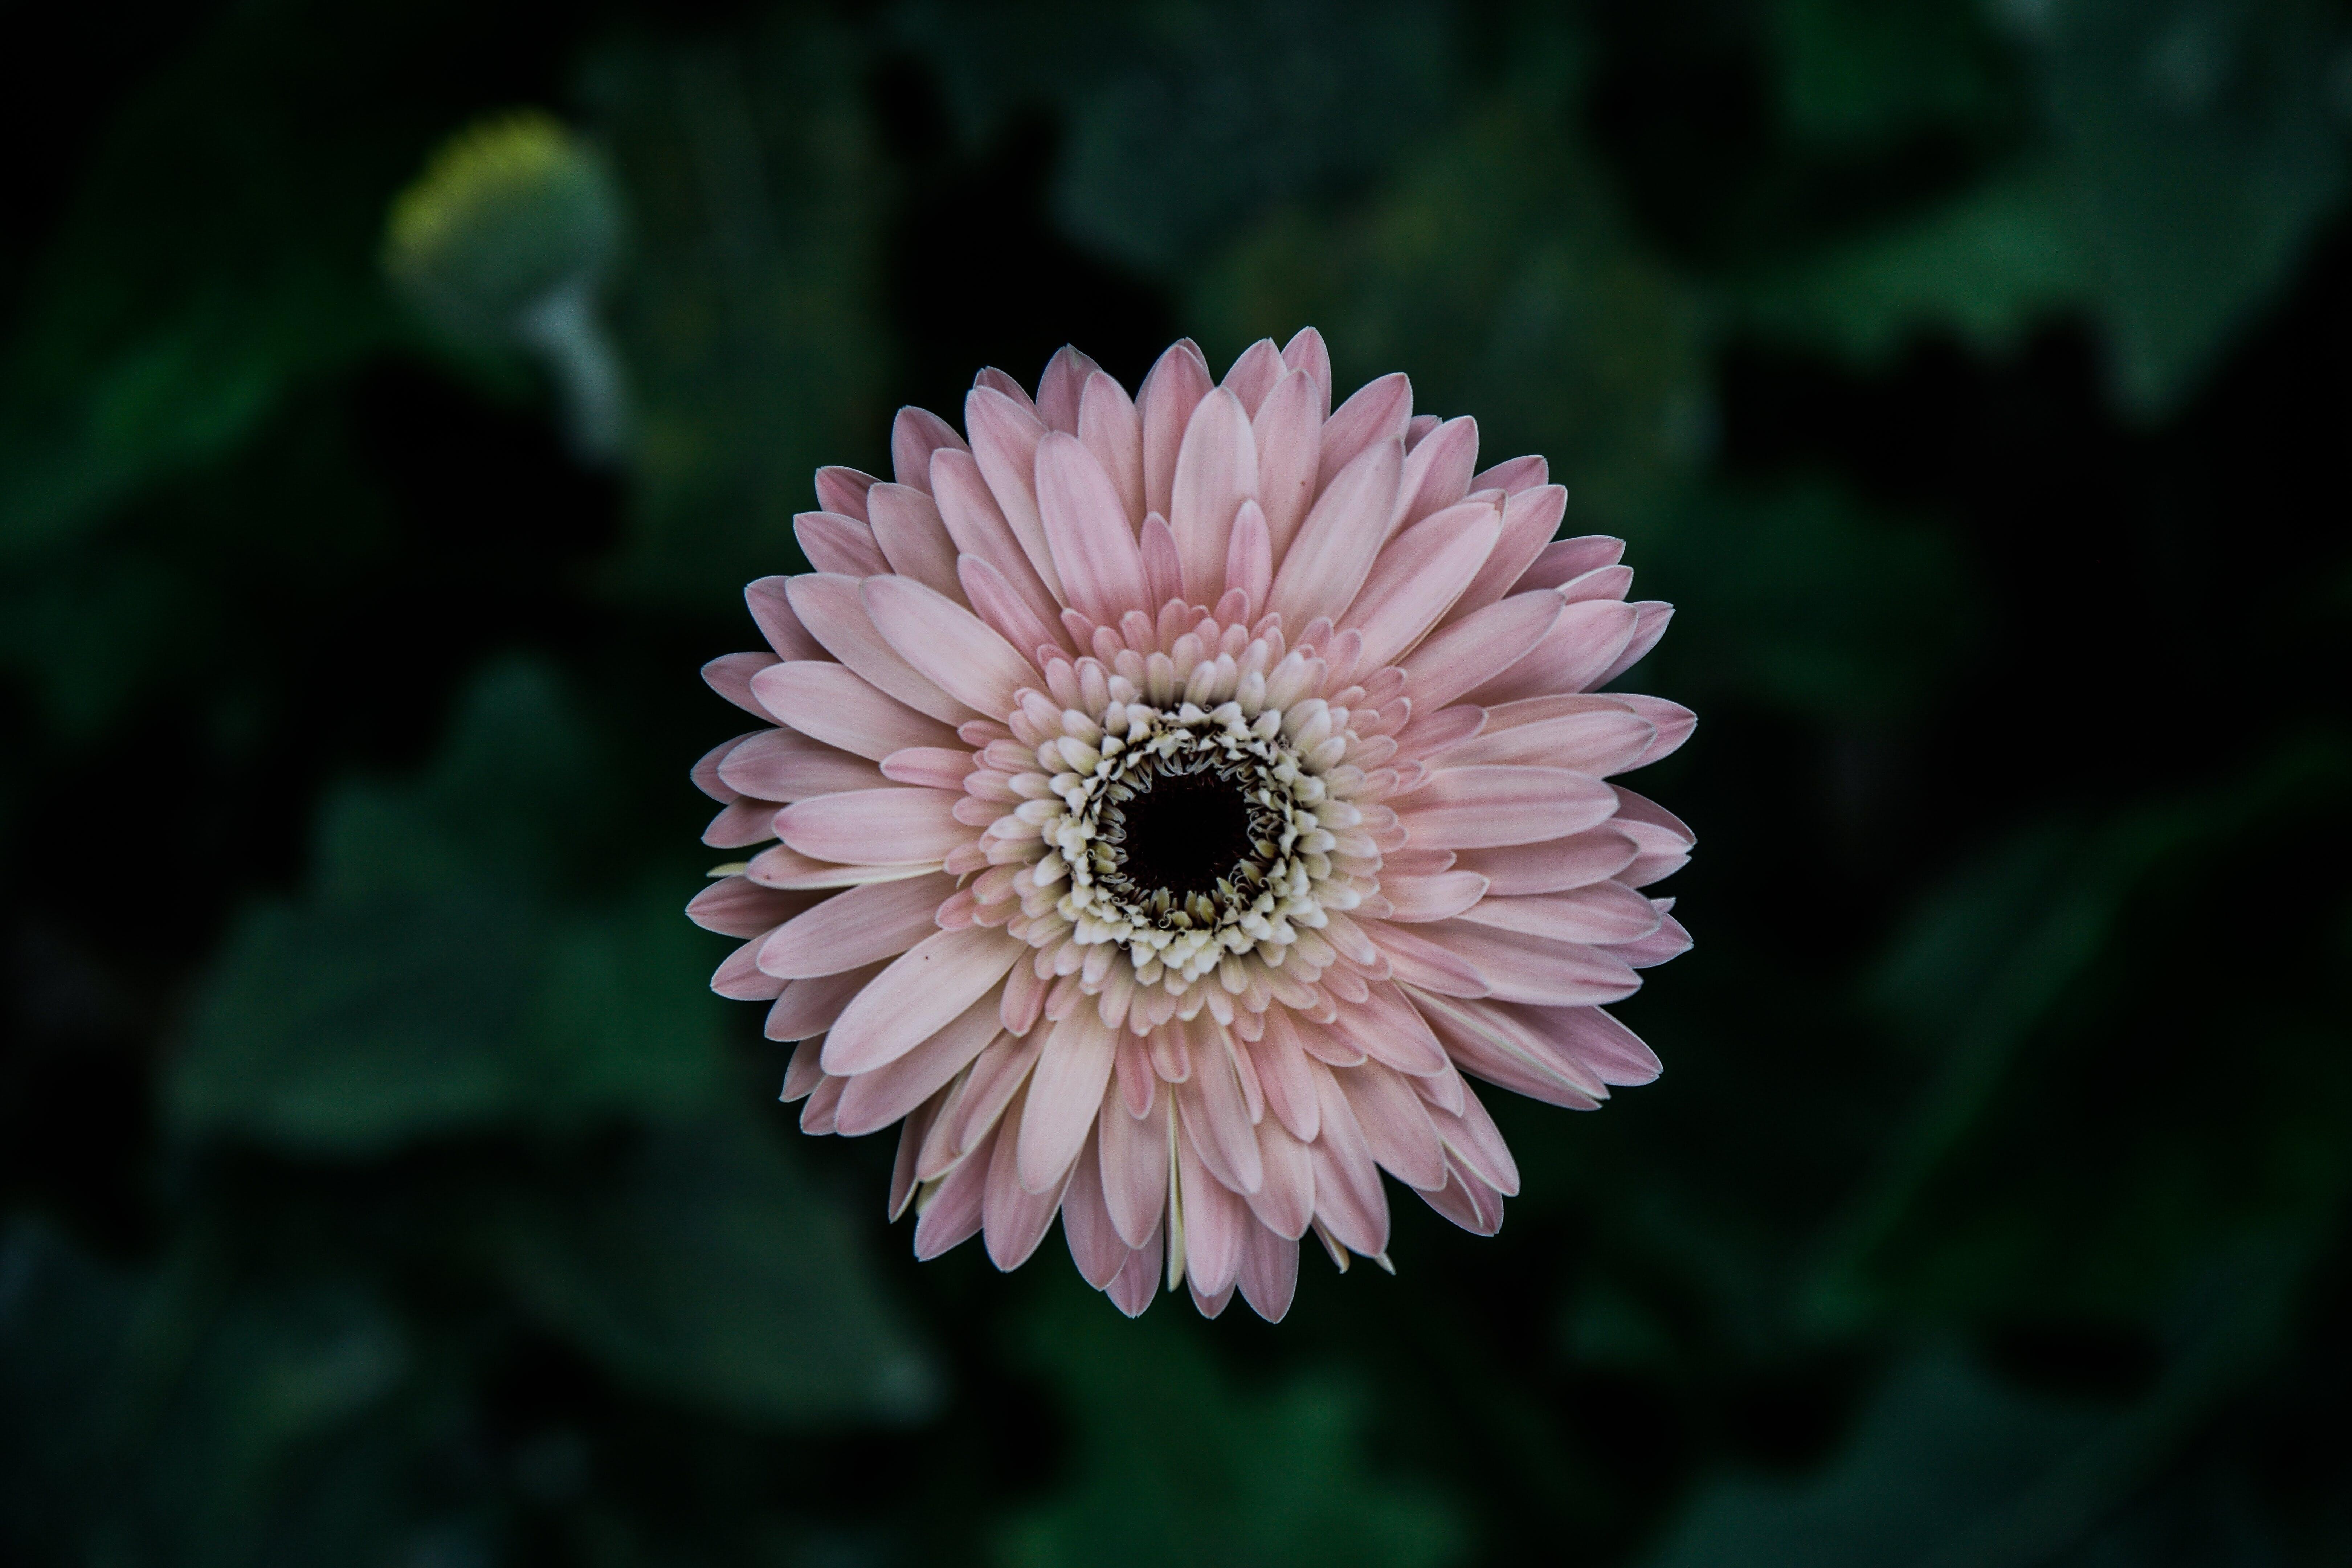 closeup, daisy, flowers